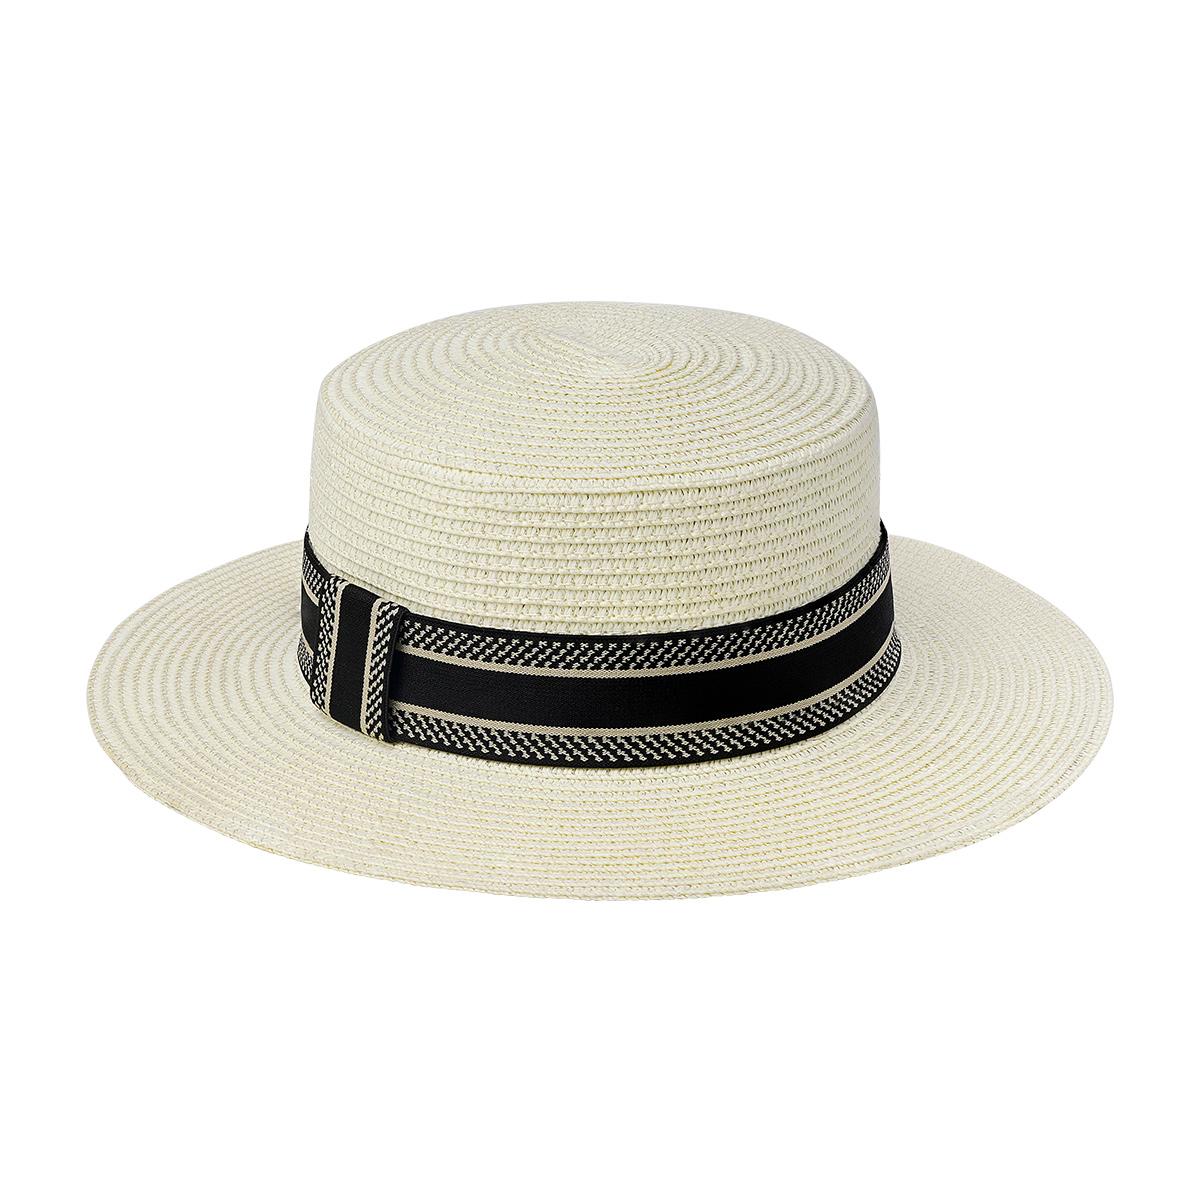 Sunny days hat off-white